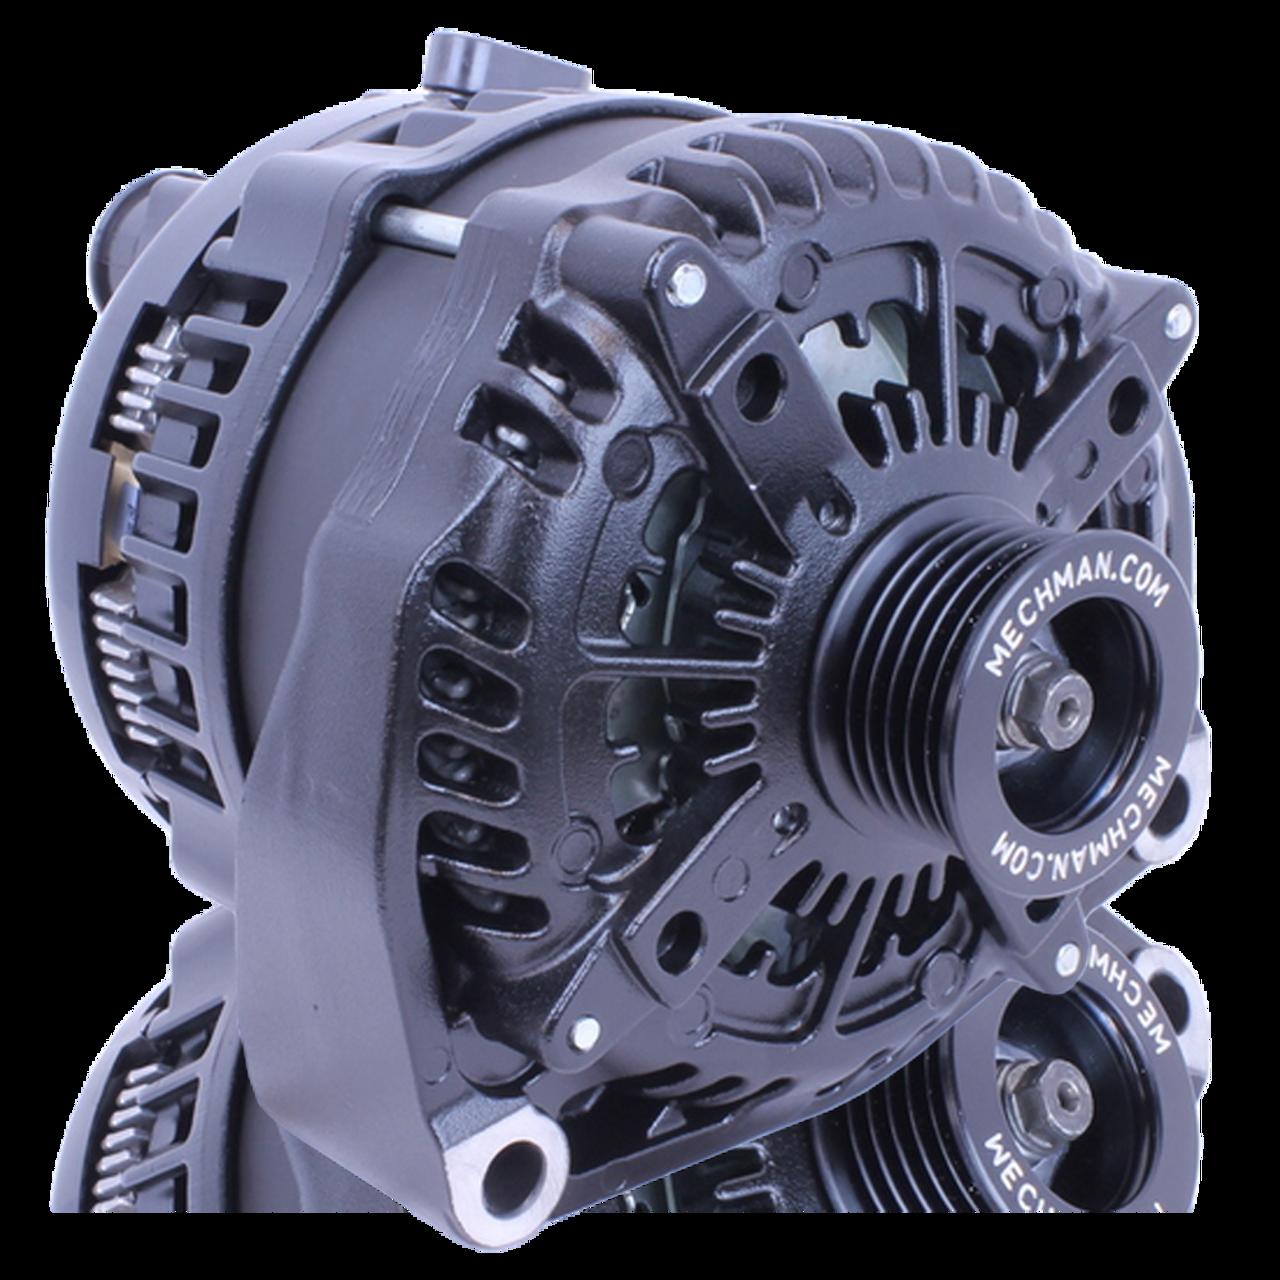 250 Amp High Output Alternator for GM SUV and Trucks 1999-on High Amp